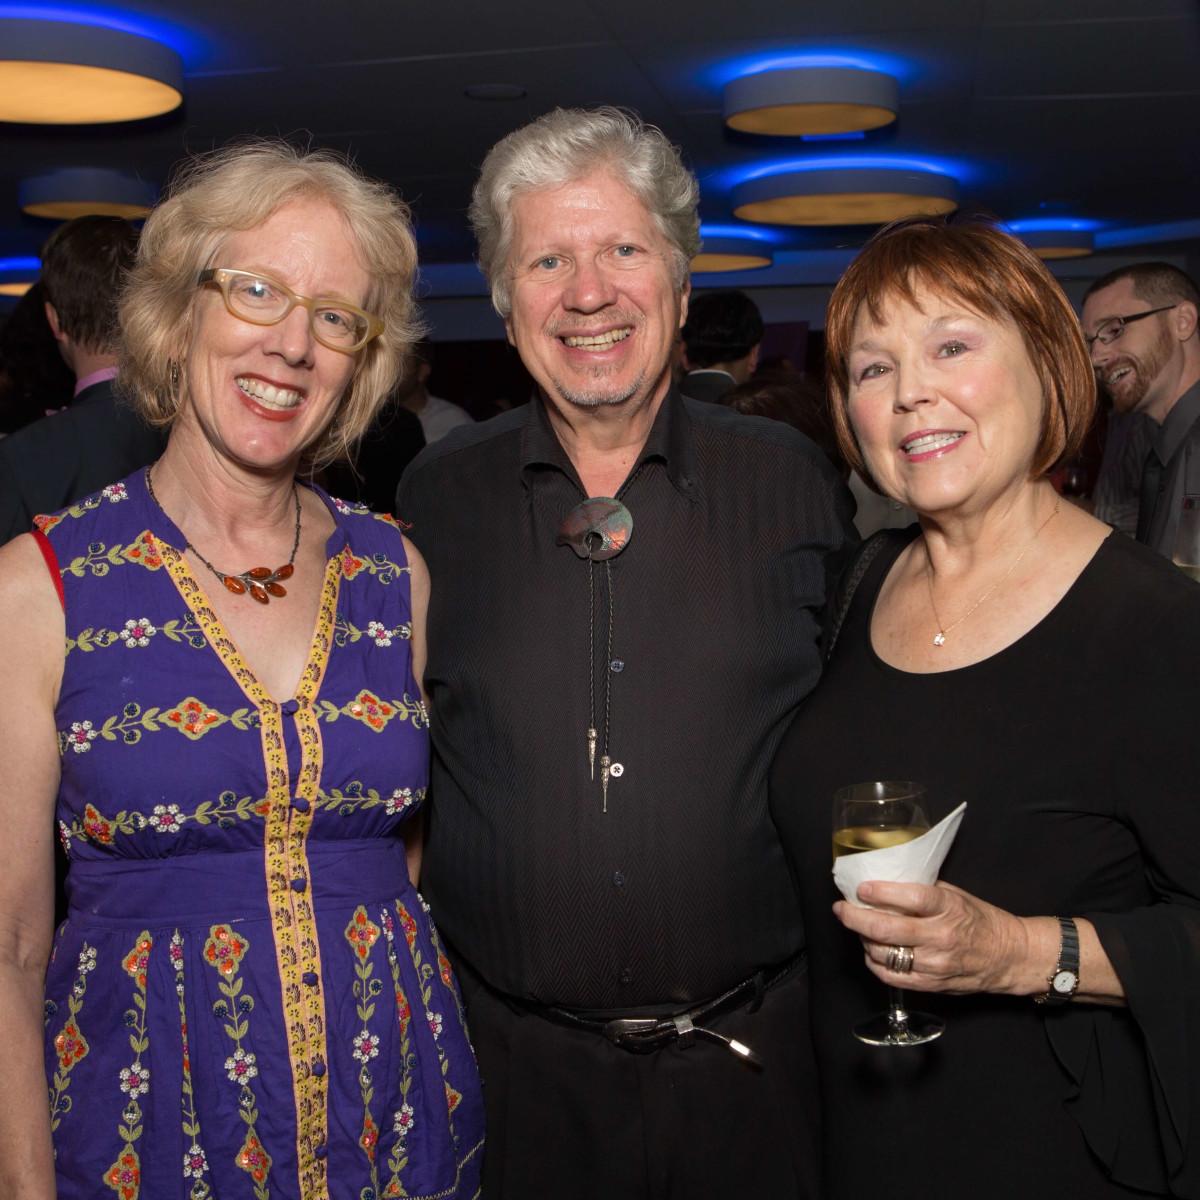 HCAF Kick-Off Party: Sarah Gish, Dave Walker, Maureen Herzog